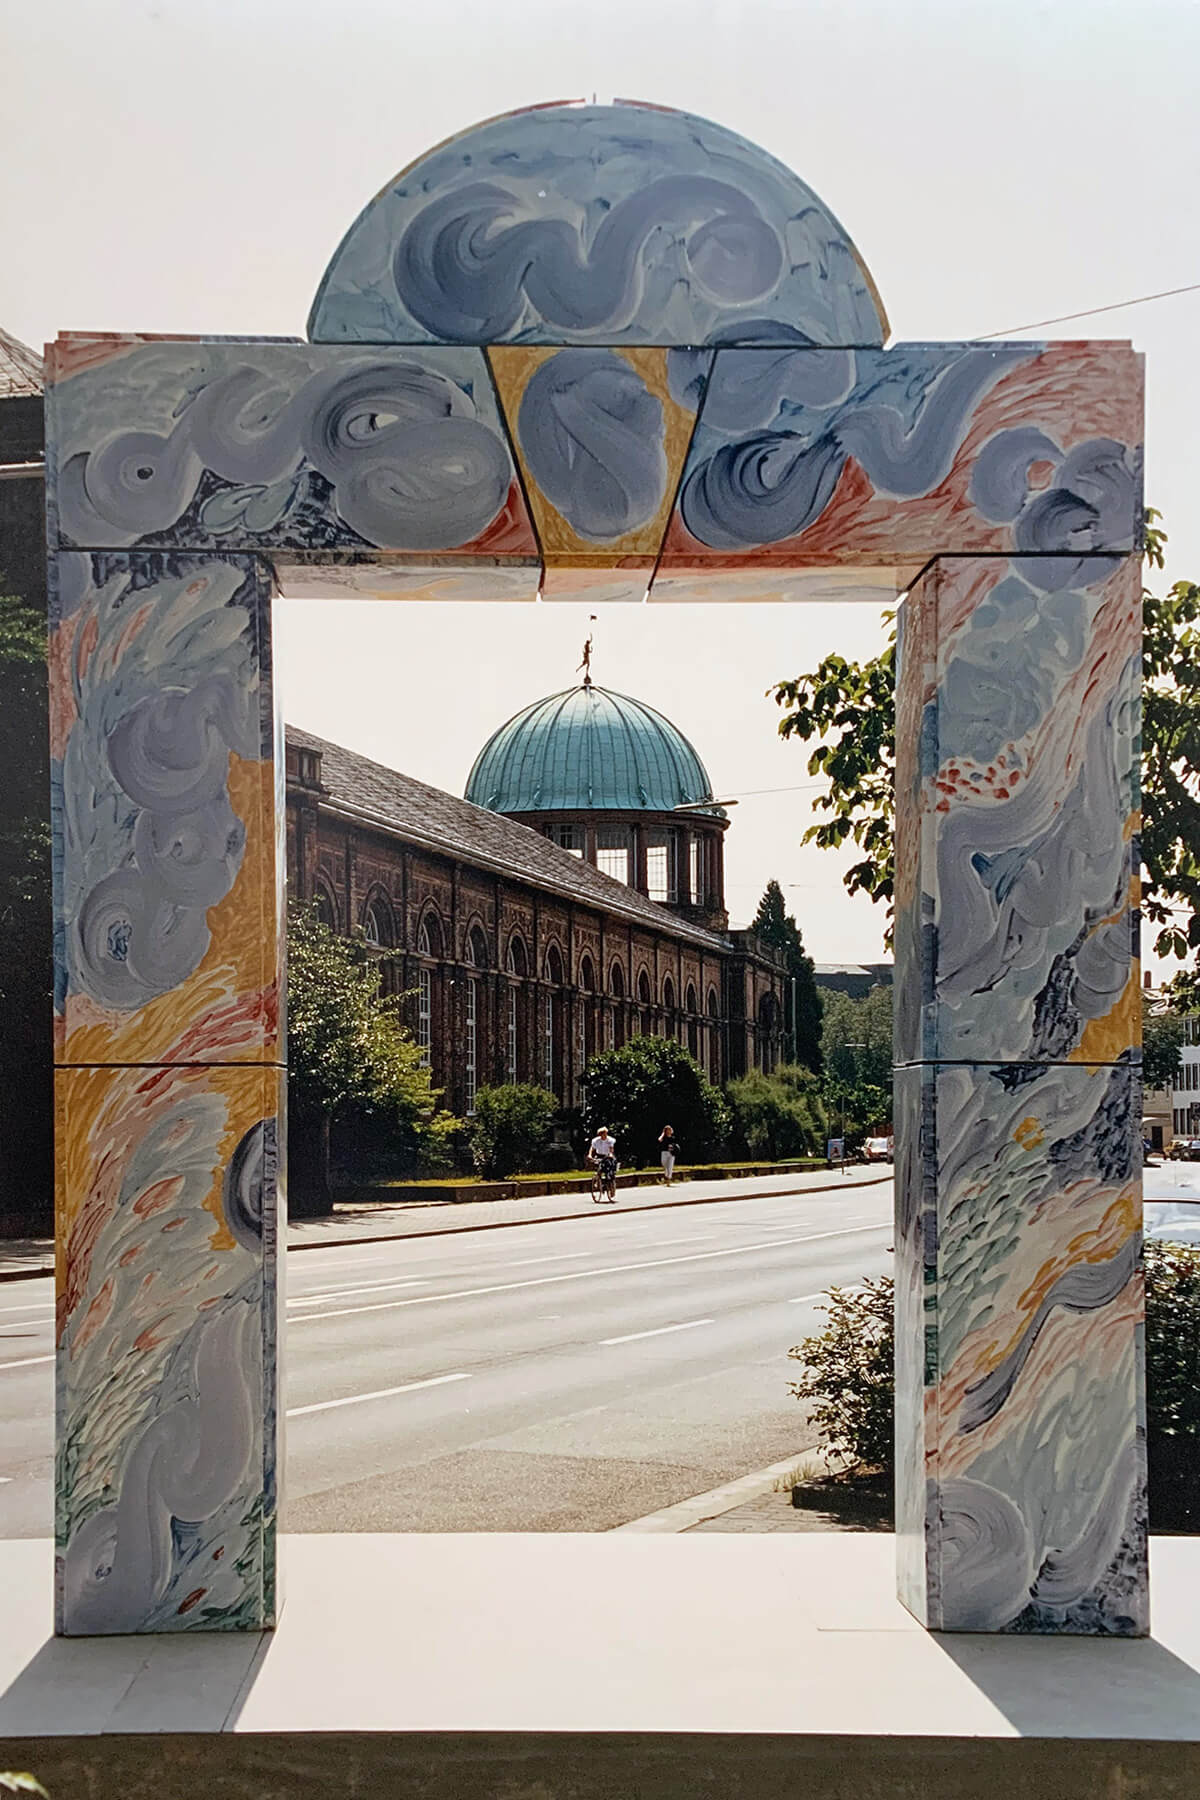 Barbara Jäger OMI Riesterer Gemeinsame öffentliche Werke Karlsruher Tor Linkenheimer Tor